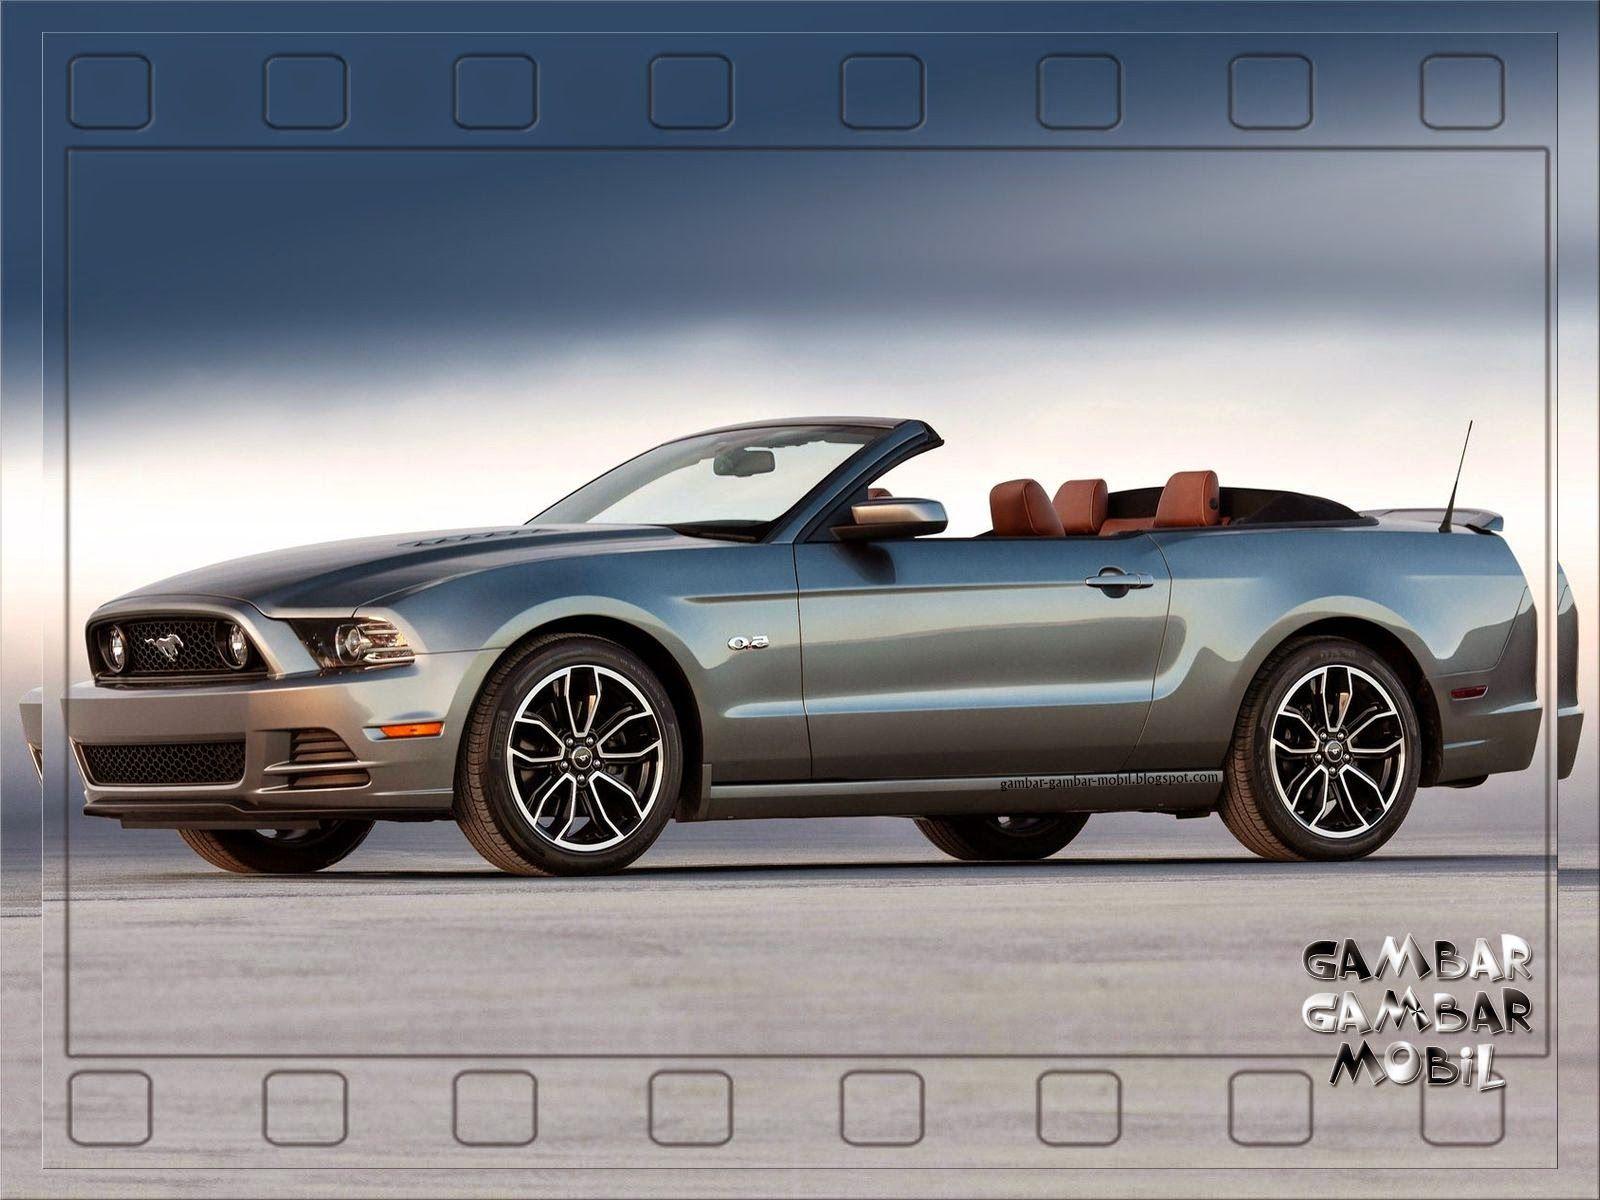 Gambar Mobil Mustang Gambar Gambar Mobil Mobil Mustang Ford Mustang Gt Mobil Ford